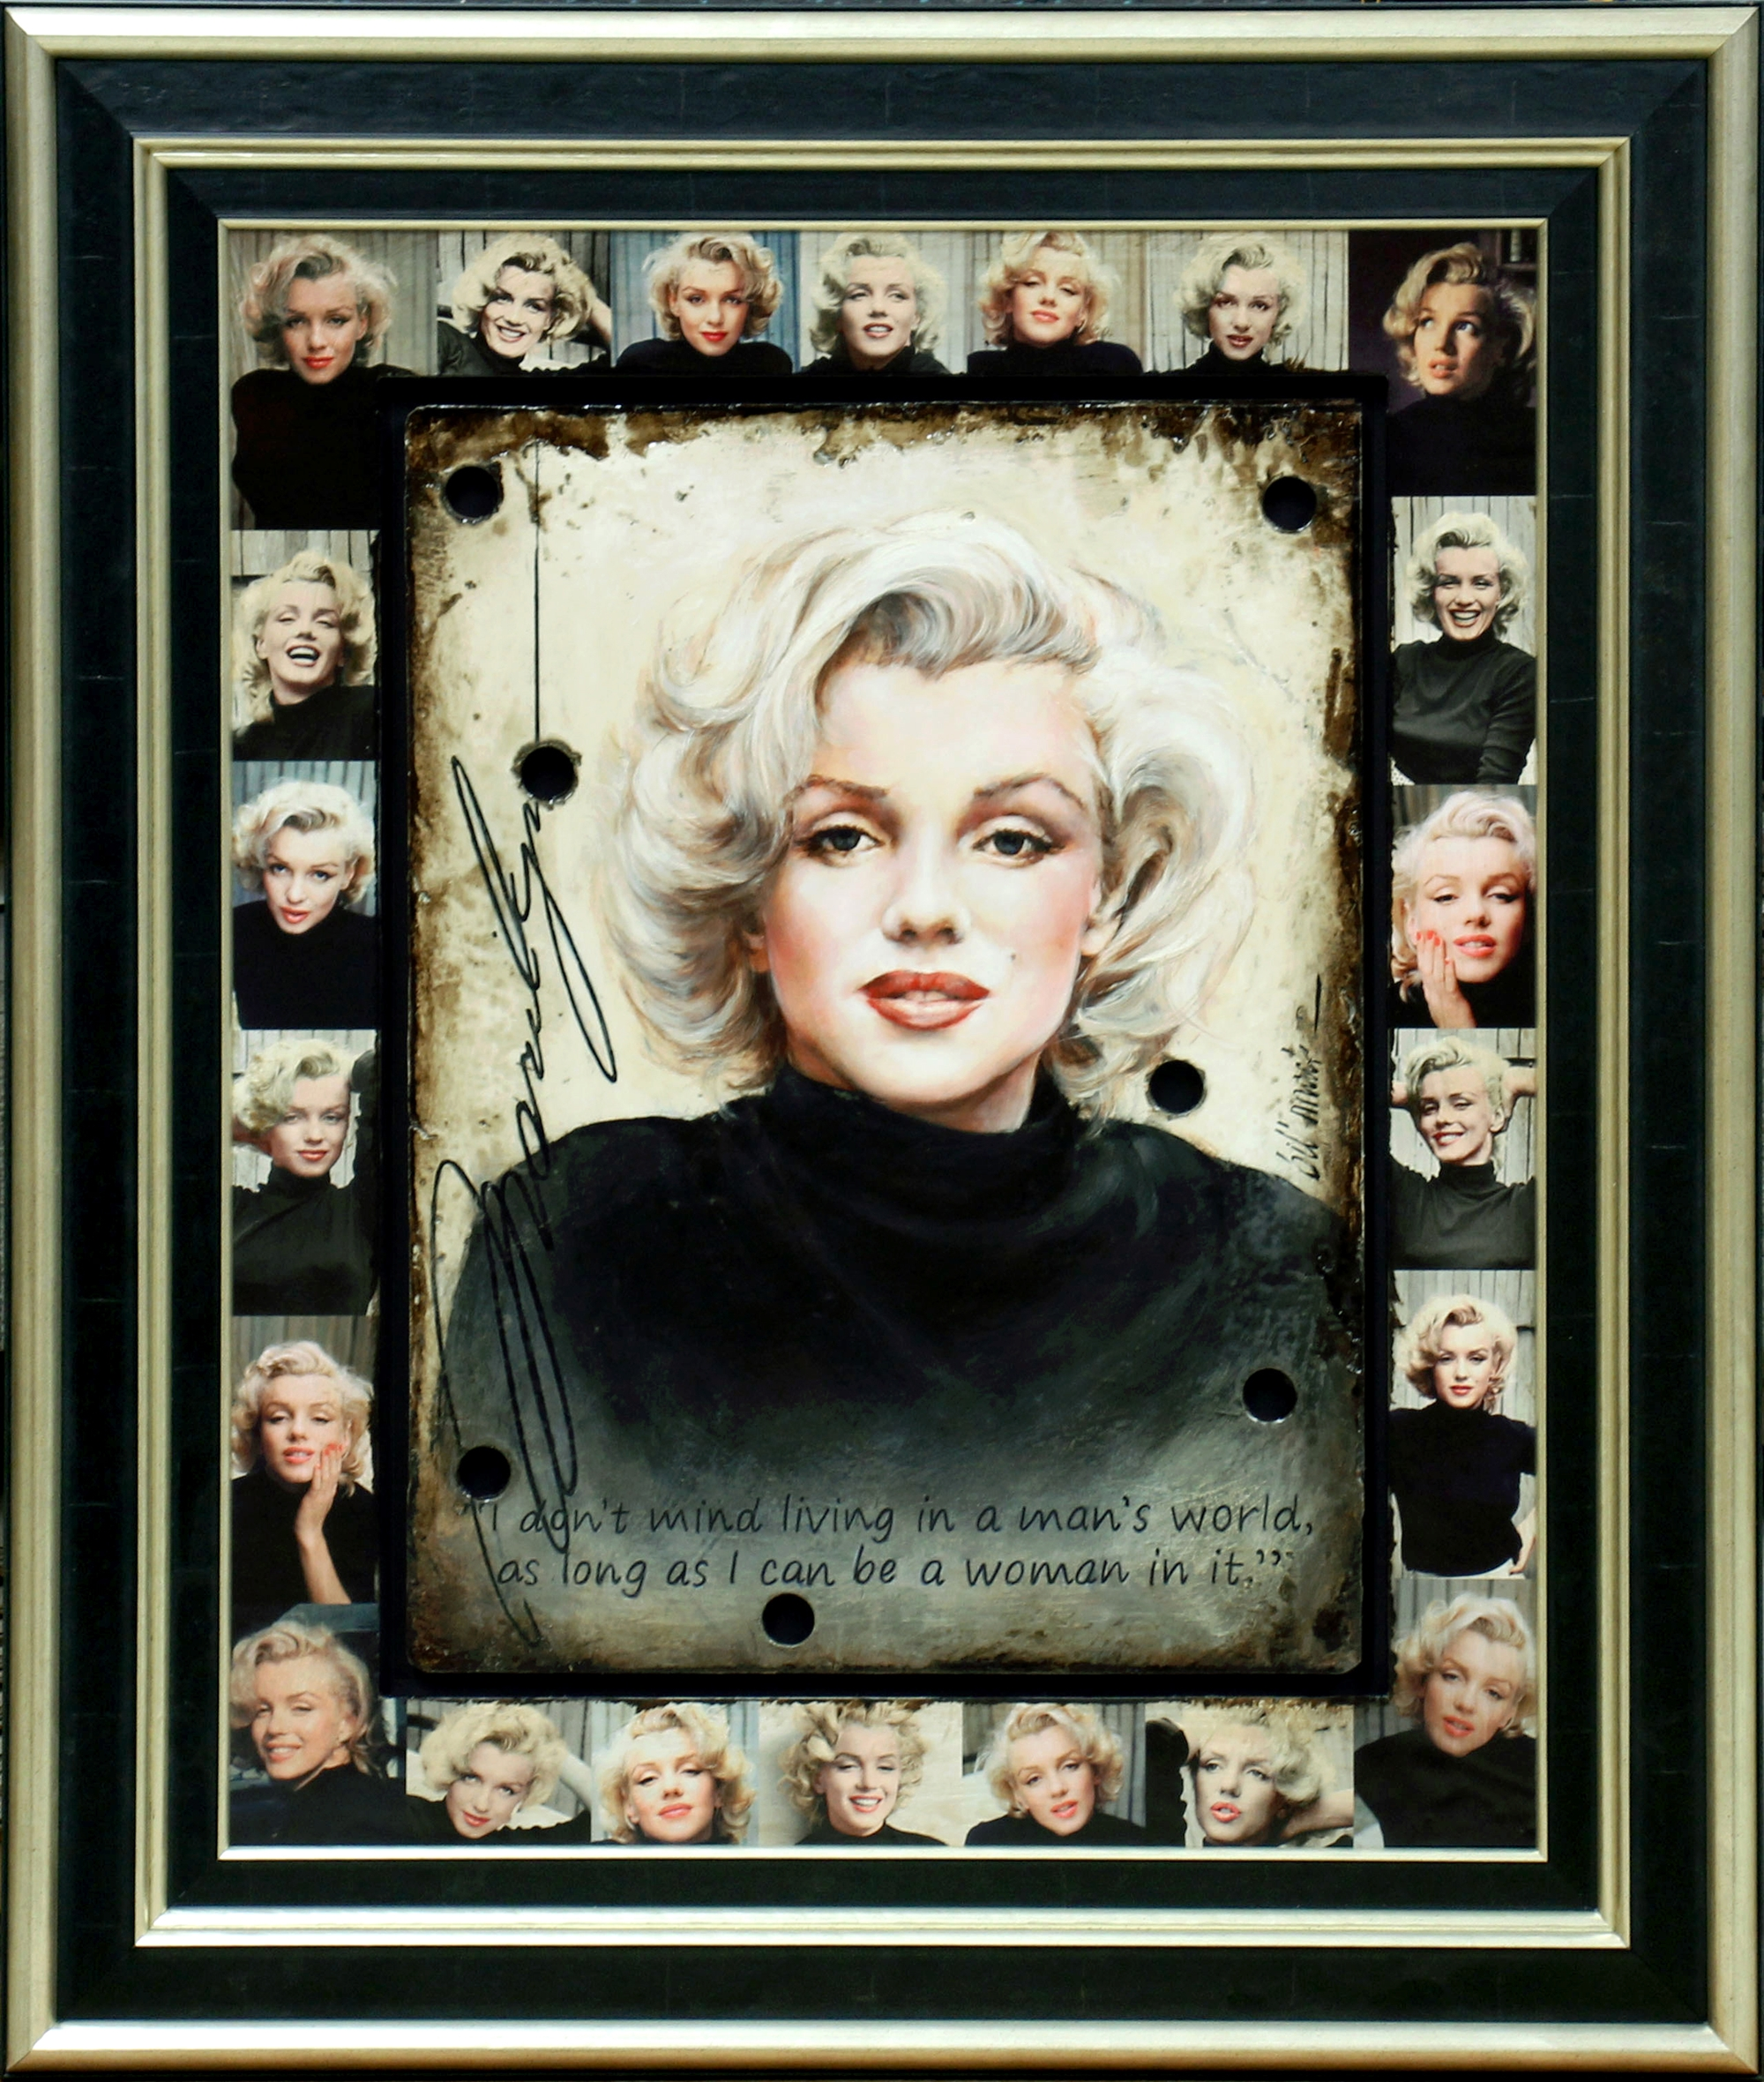 Marilyn Man's World by Bill Mack Hollywood Sign